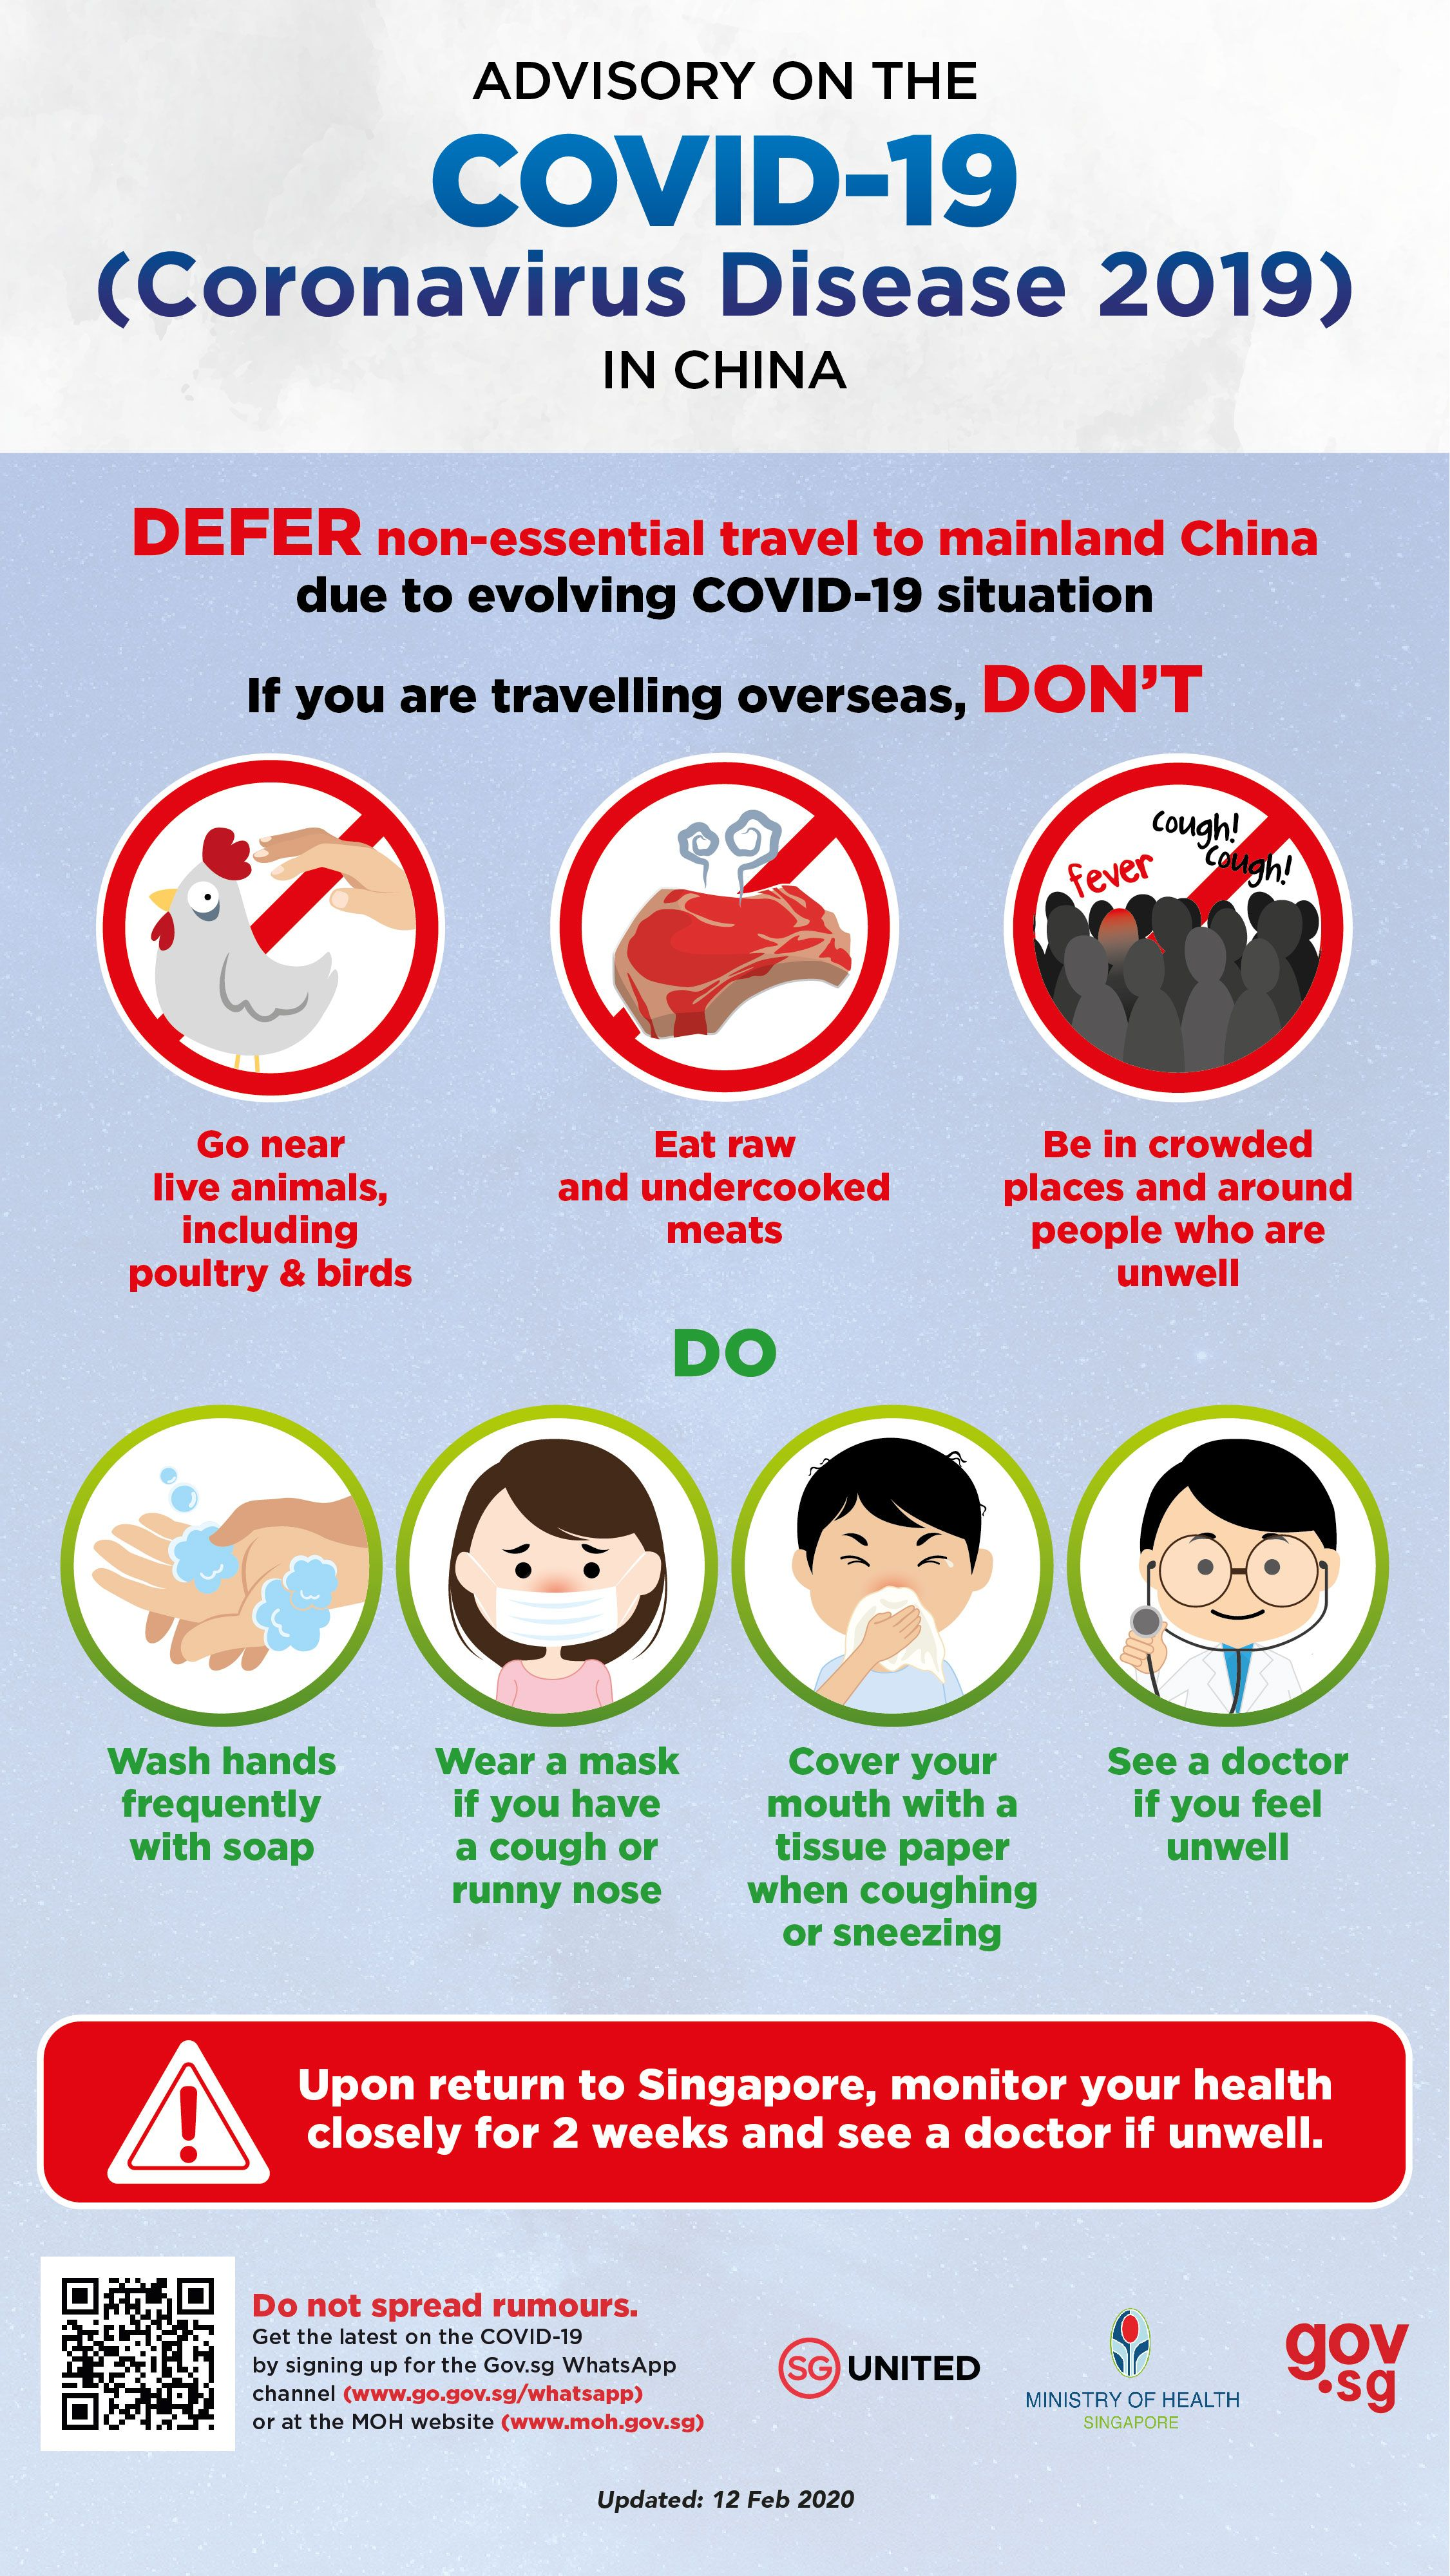 Advisory on Coronavirus Disease 2019